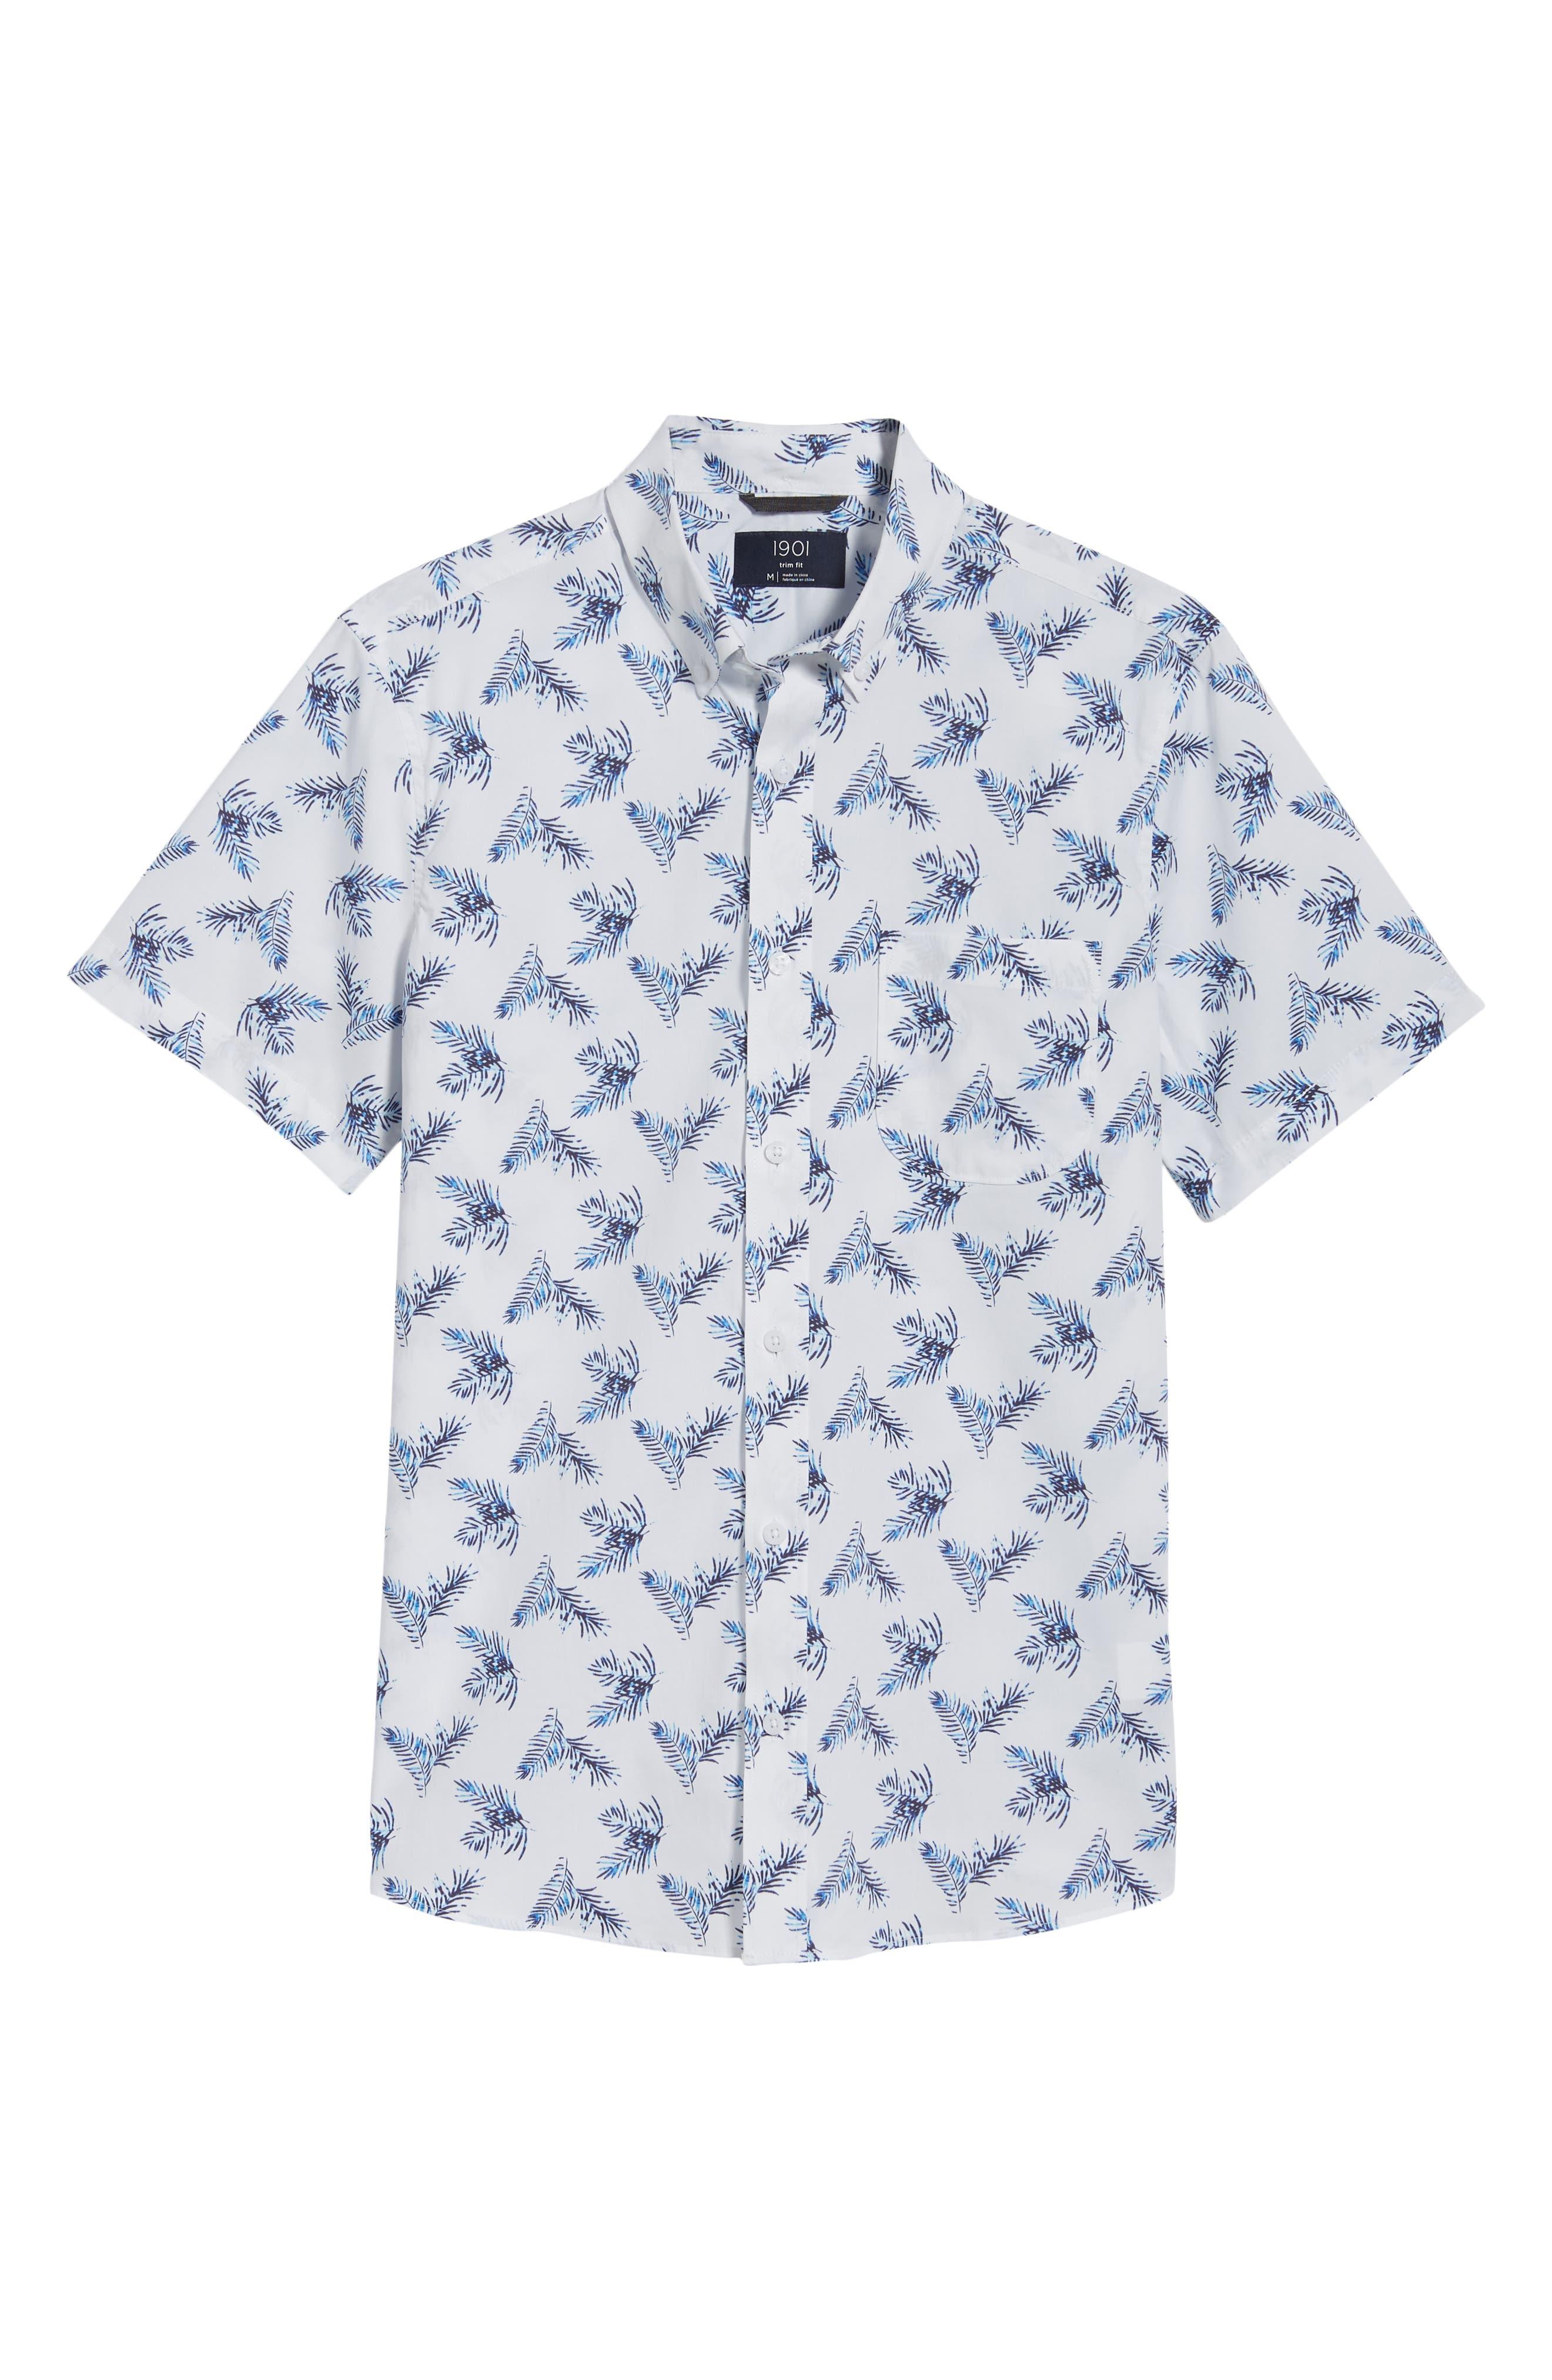 Trim Fit Palm Print Sport Shirt,                             Alternate thumbnail 6, color,                             White Blue Palm